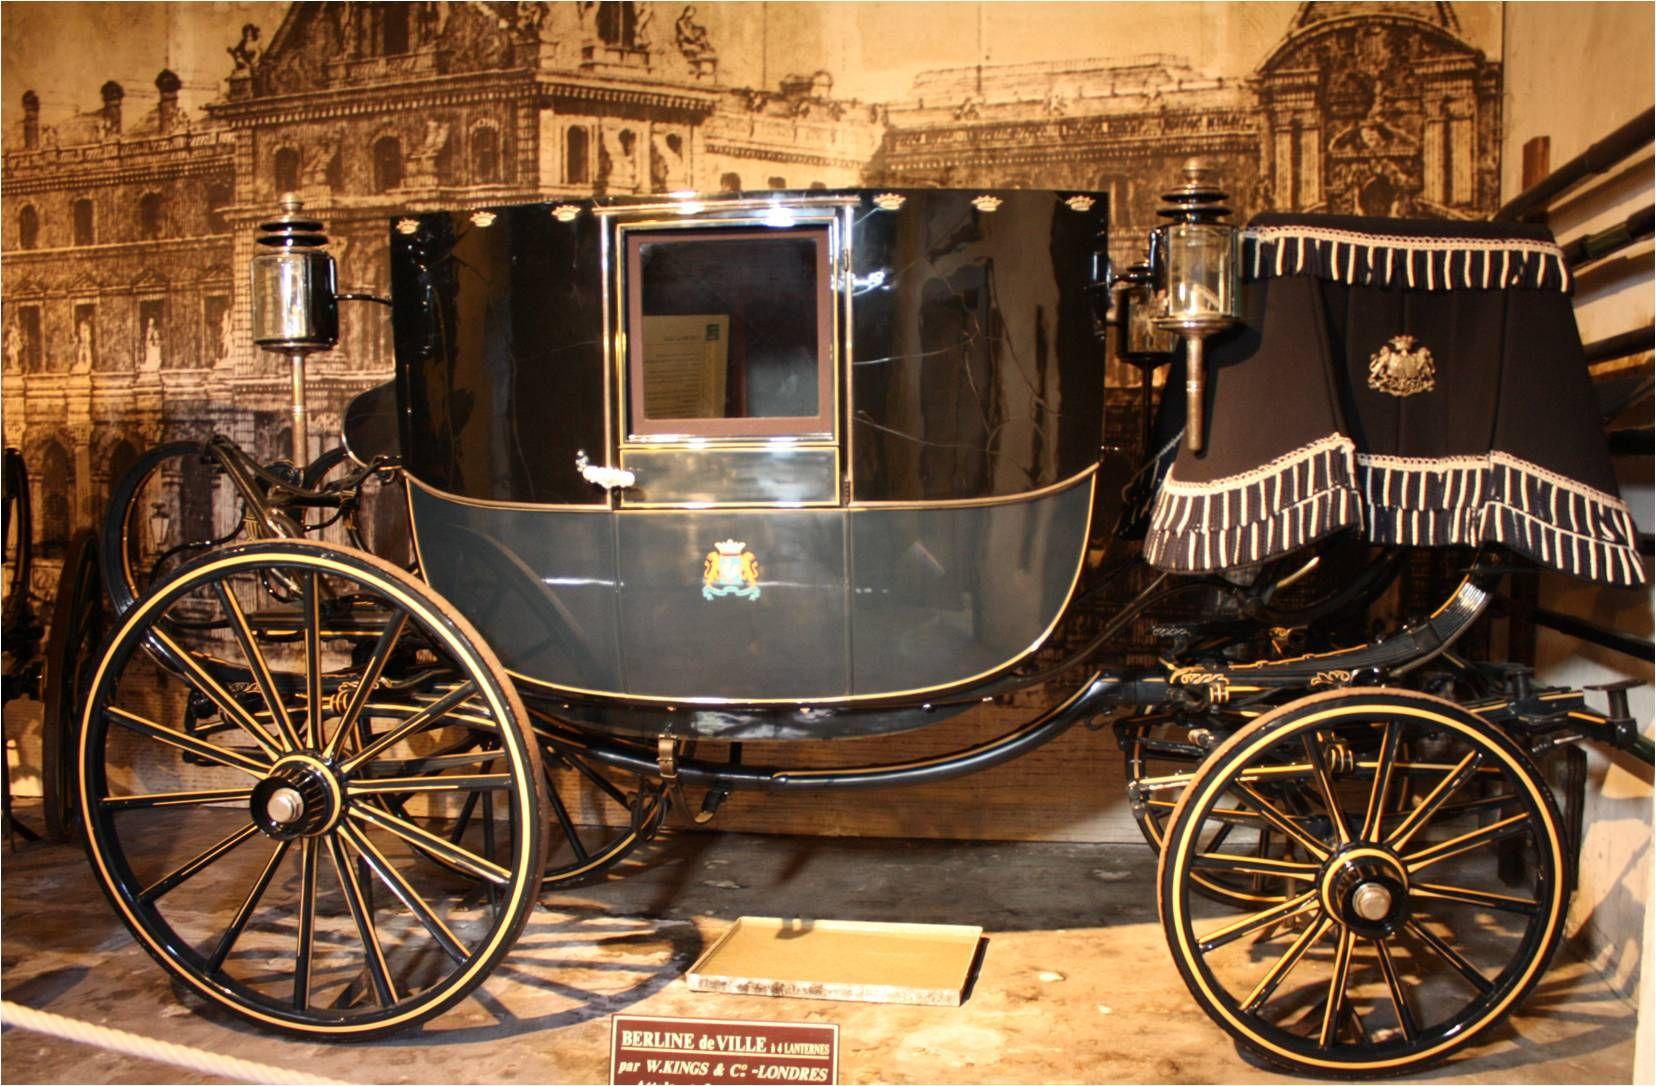 Berline / Carriage Museum at Chateau Vaux le Vicomte, France